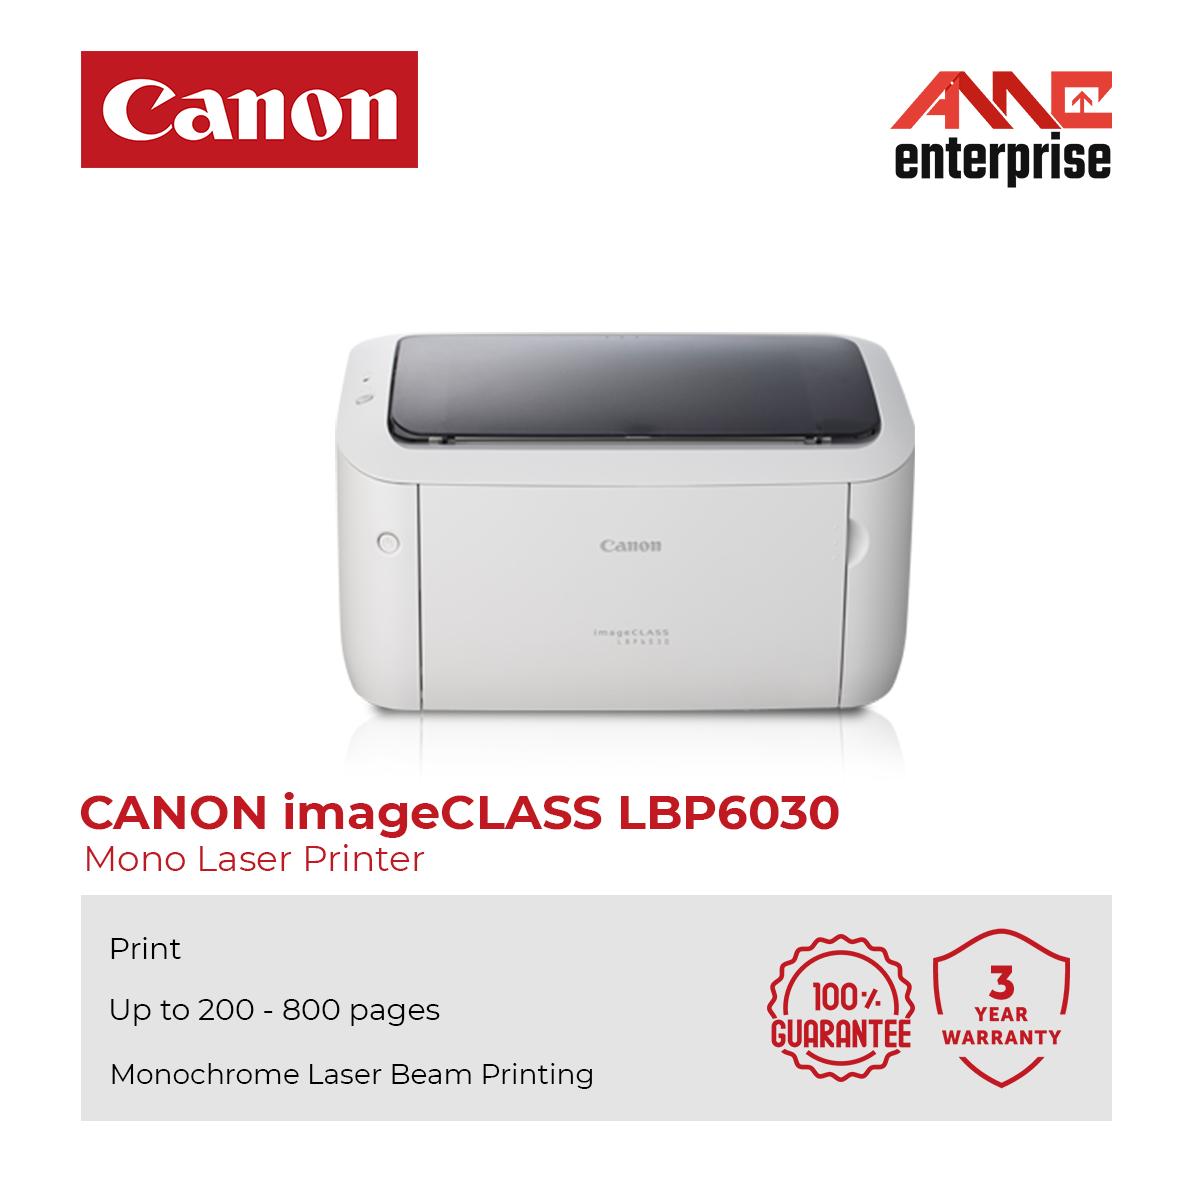 CANON imageCLASS LBP6030 PRINTER (1).png